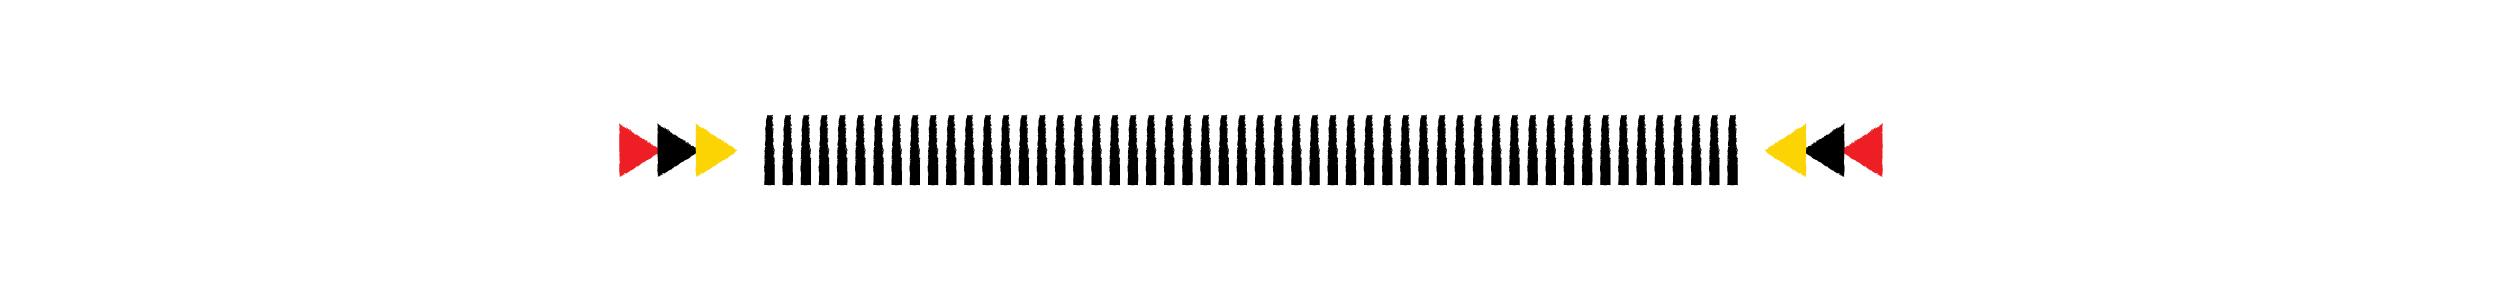 border2.jpg